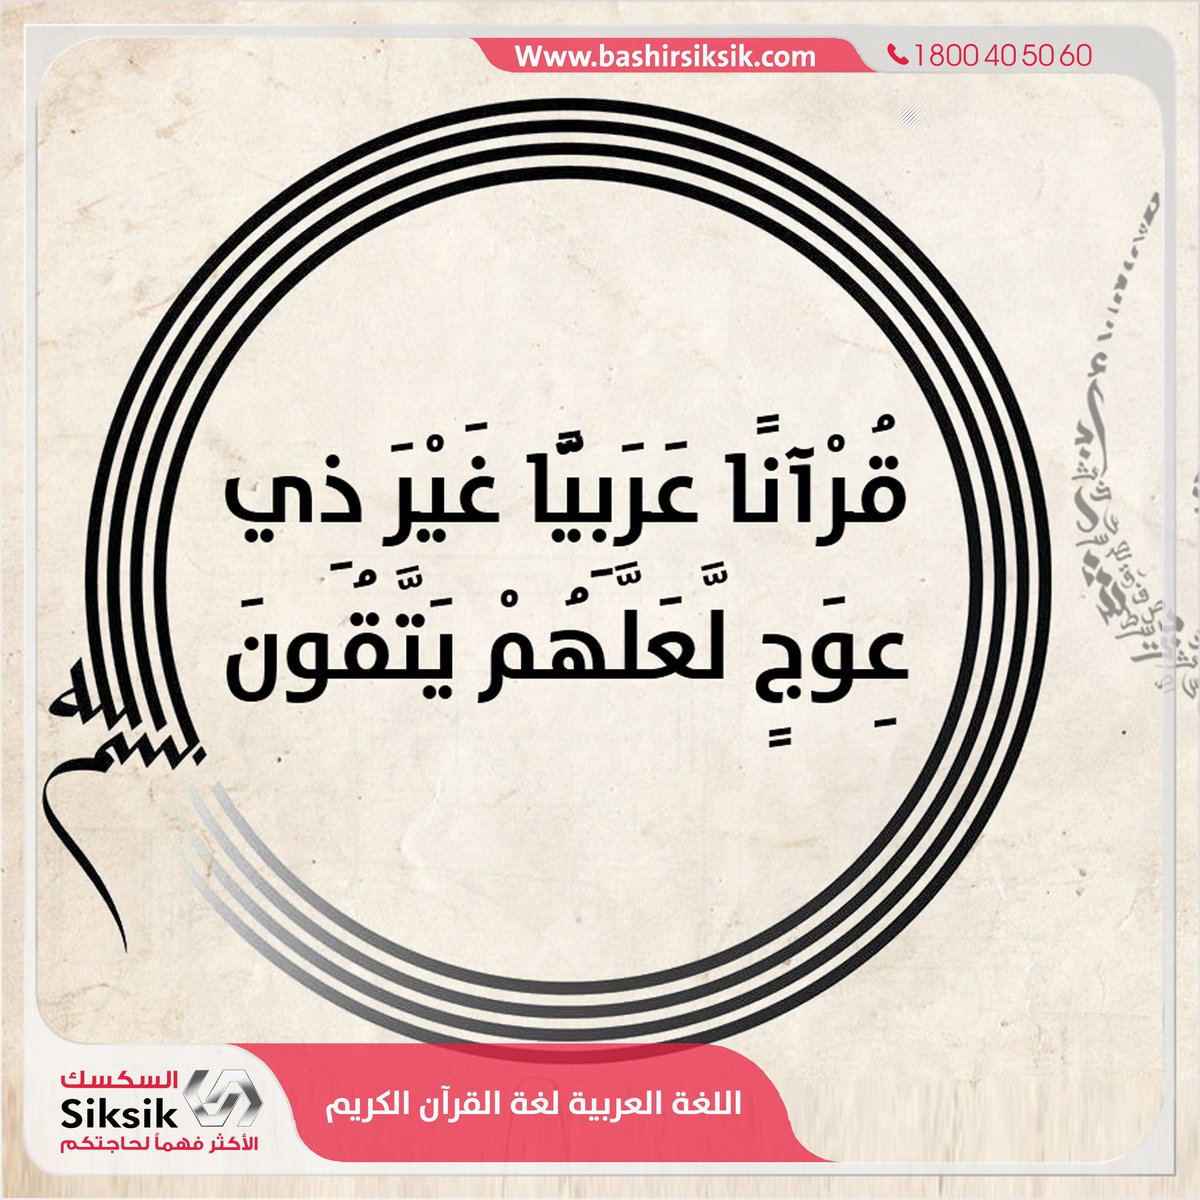 Bashir Siksik En Twitter اللغة العربية لغة القرآن الكريم اليوم العالمي للغة العربية ب ١٠ اليوم العالمي للغة العربية